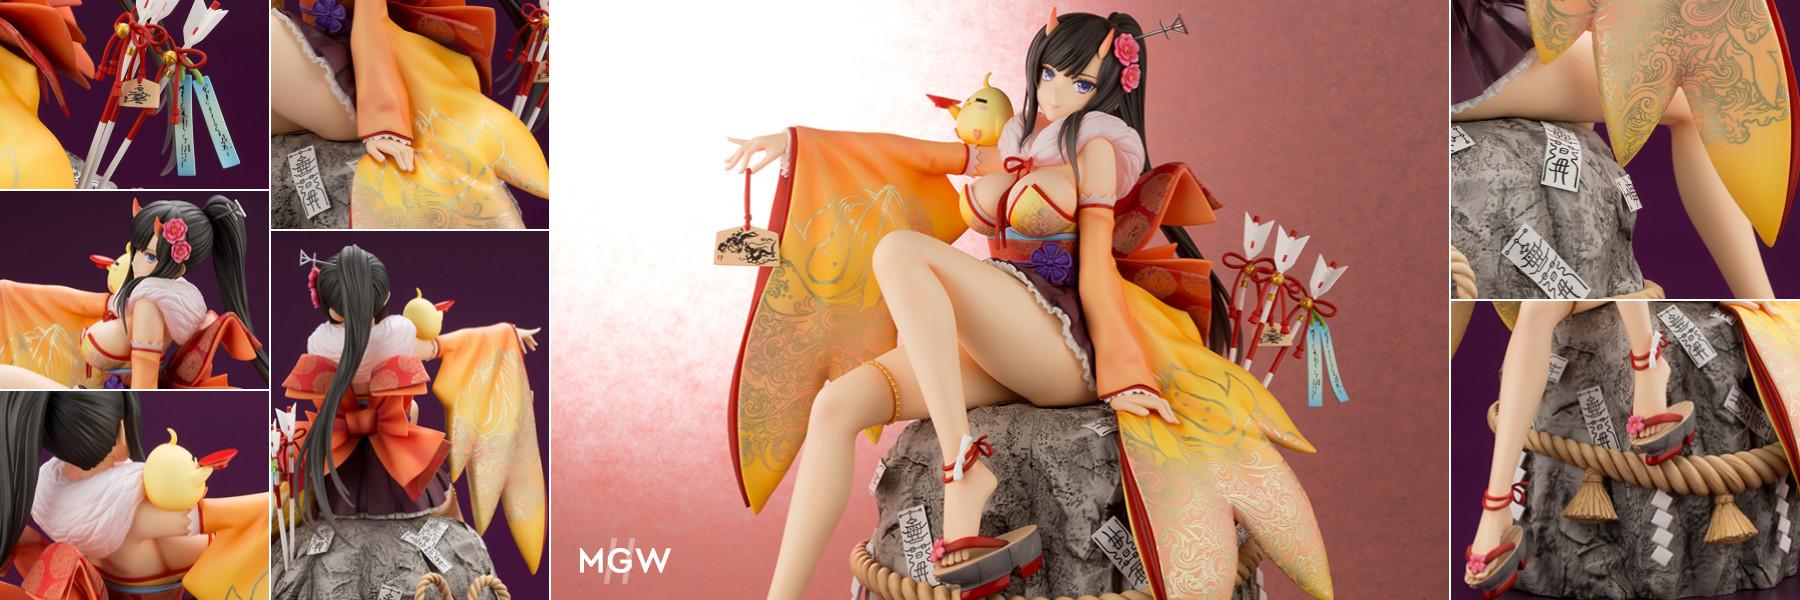 Azur Lane Ryuuhou Firebirds New Year Dance ver by Kotobukiya MyGrailWatch Anime Figure Guide